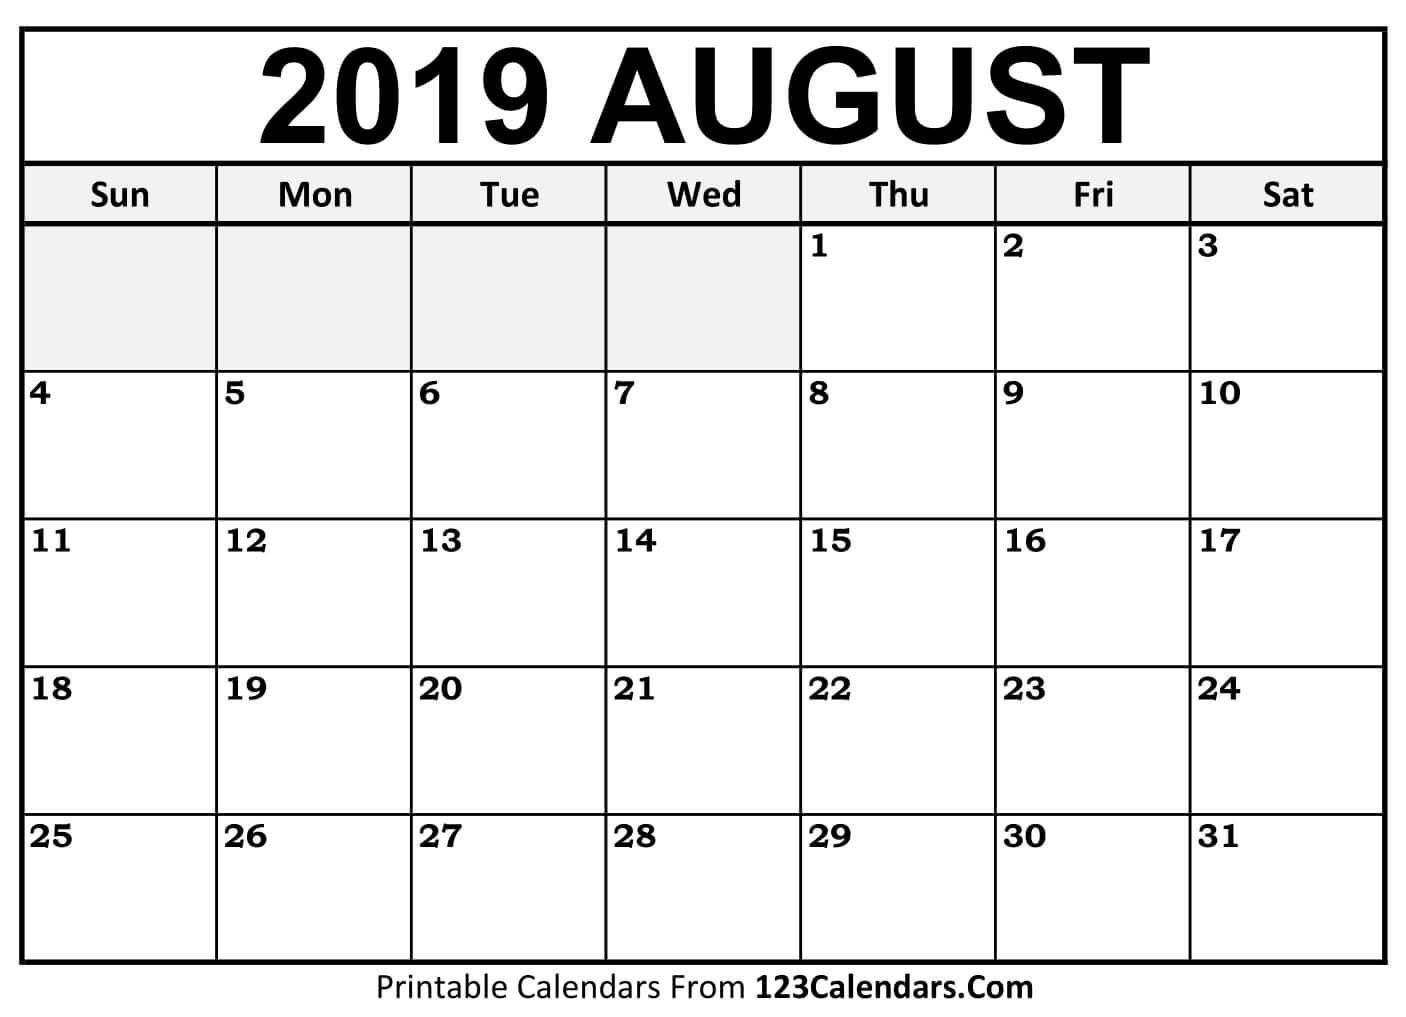 Month Of August 2019 Printable Calendar | Calendar Template with August Monthly Calendar Template Printable